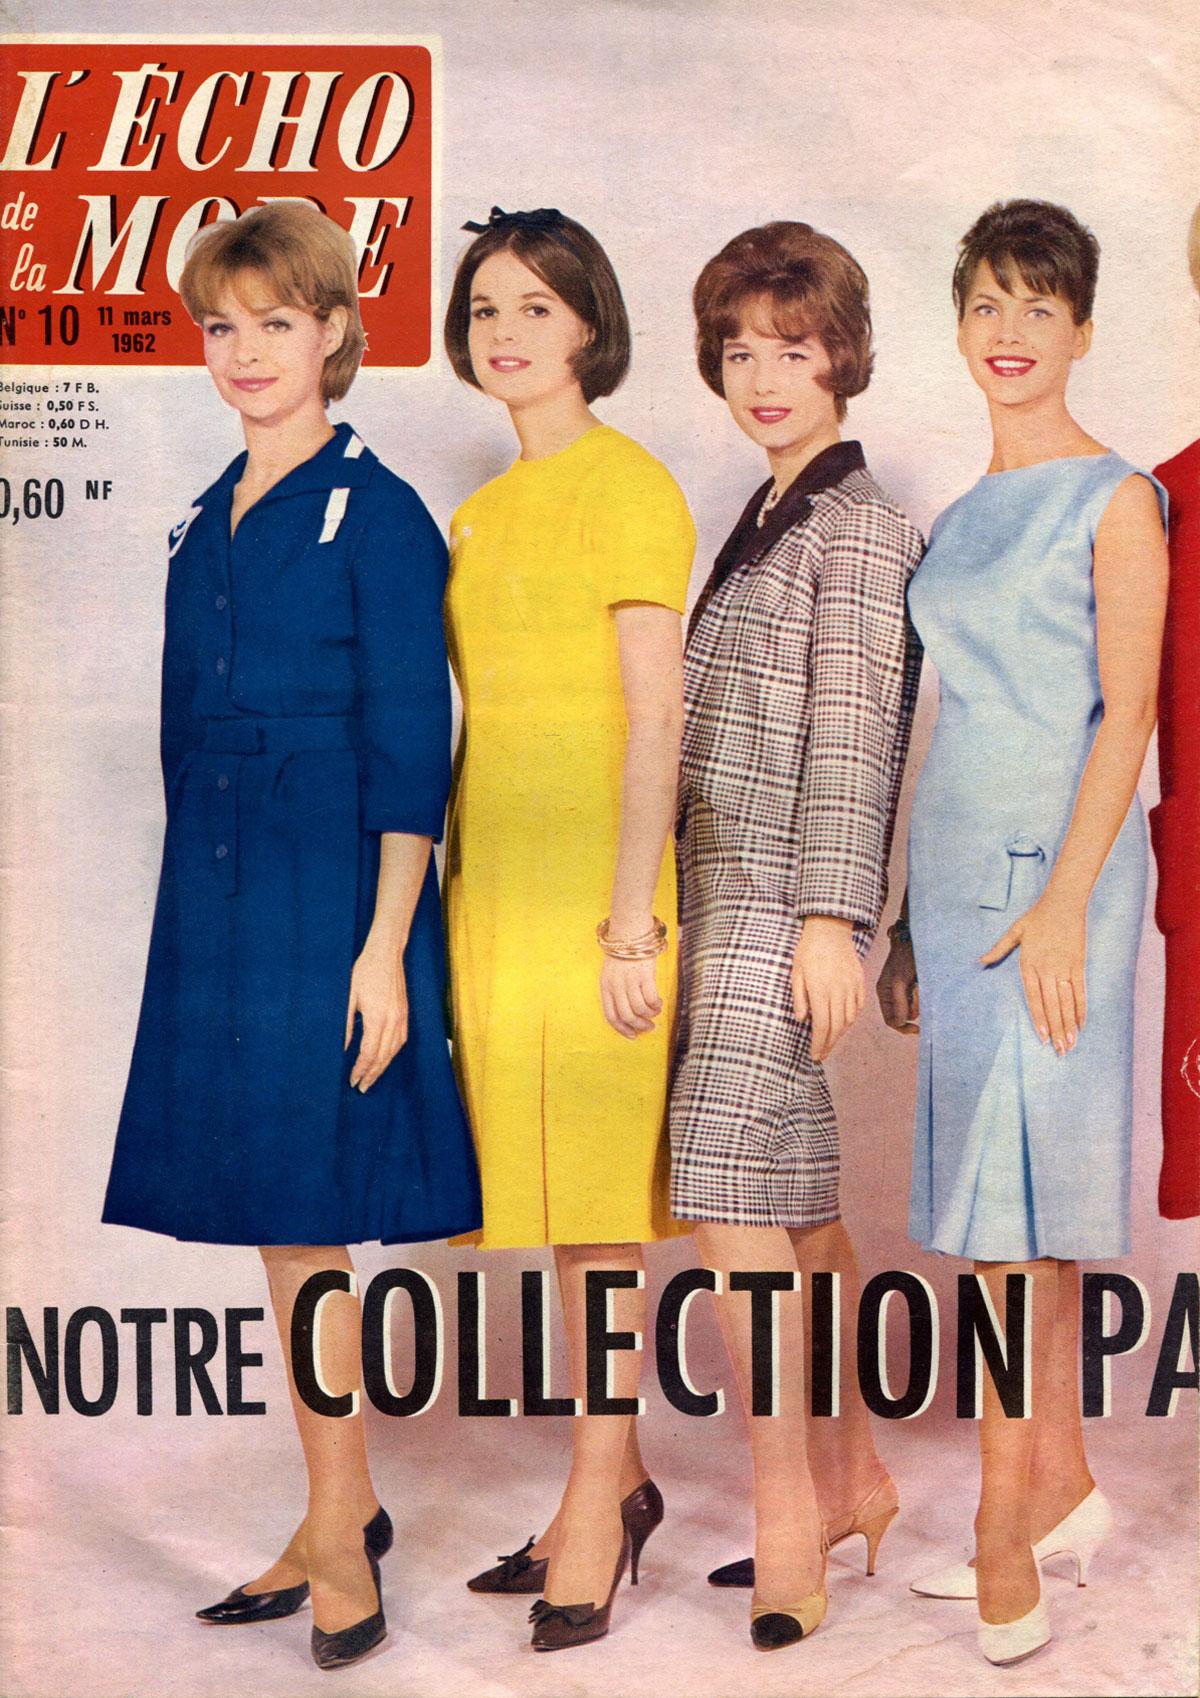 Echo de la mode, №10, mars 1962